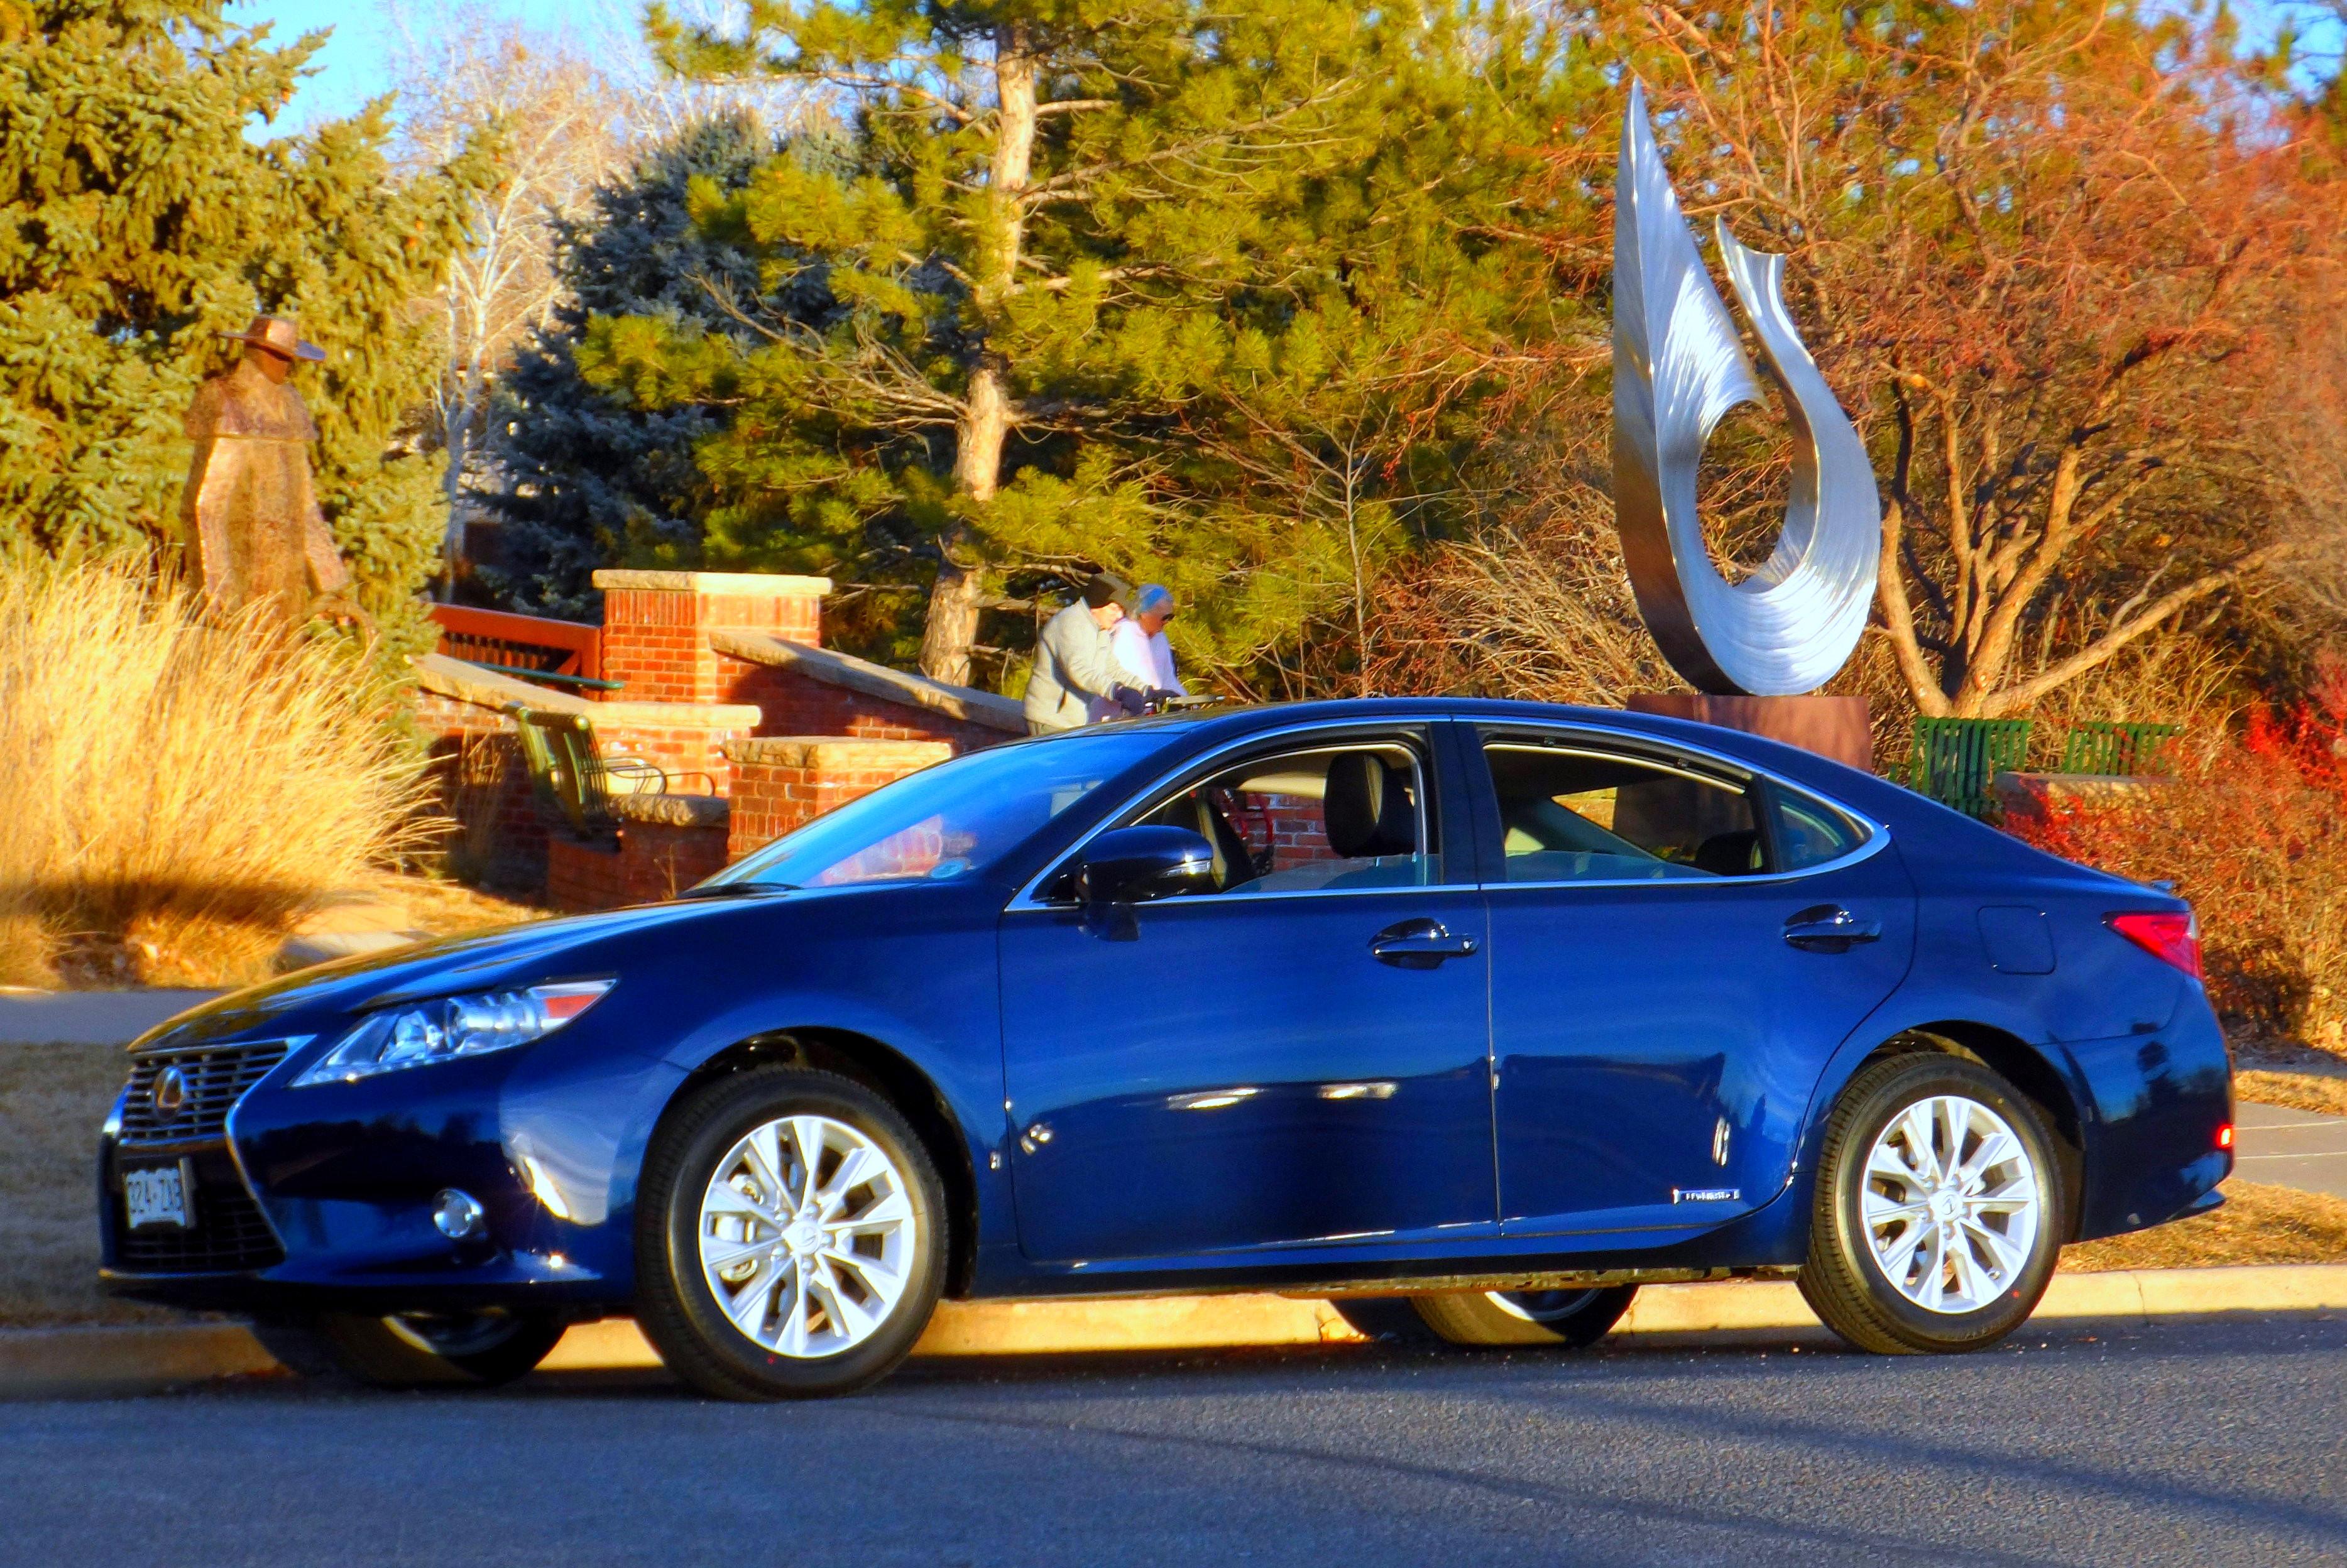 2013 Lexus ES300h FWD Sedan – Stu s Reviews